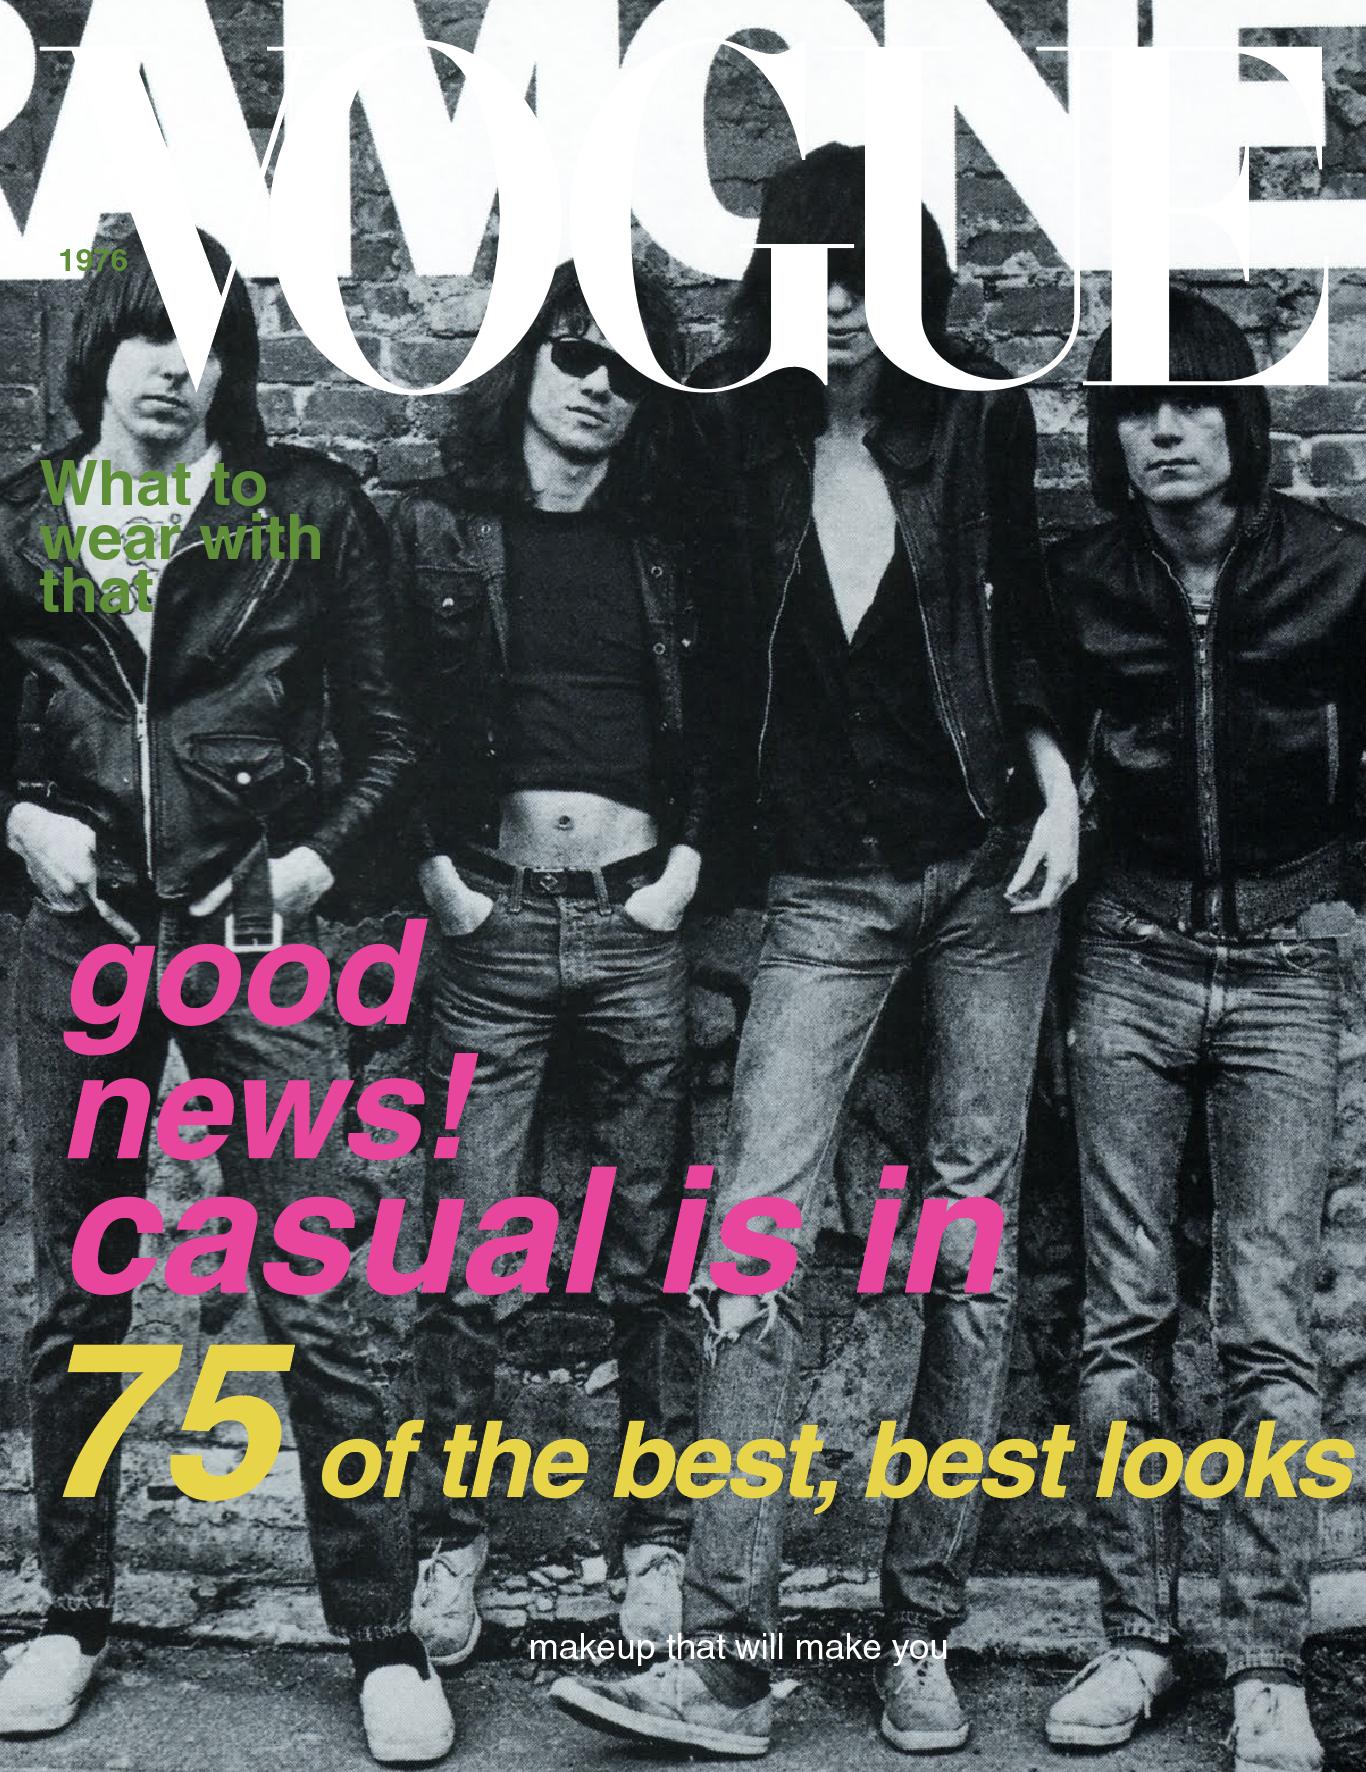 Ramones/ 1976 American Vogue